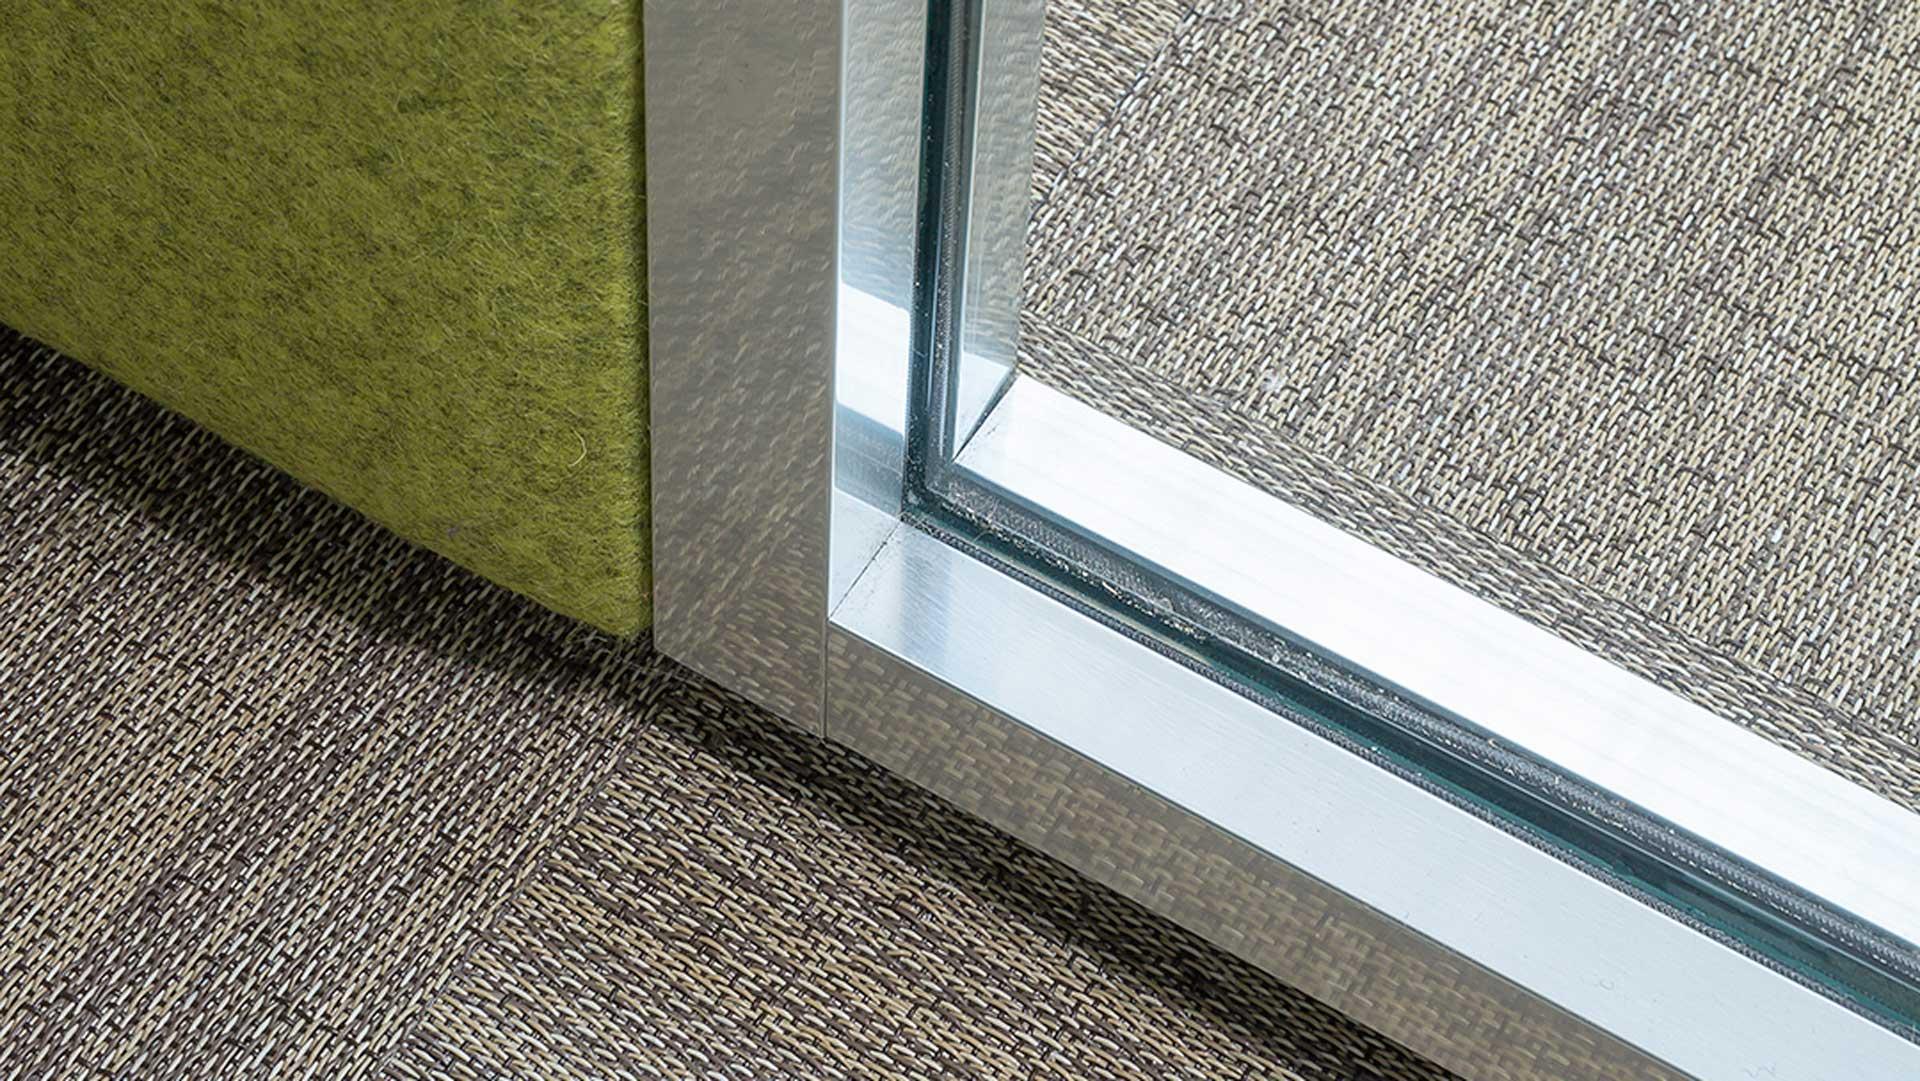 Pareti-divisorie-ufficio-in-vetro-3-Level-Office-Landscape